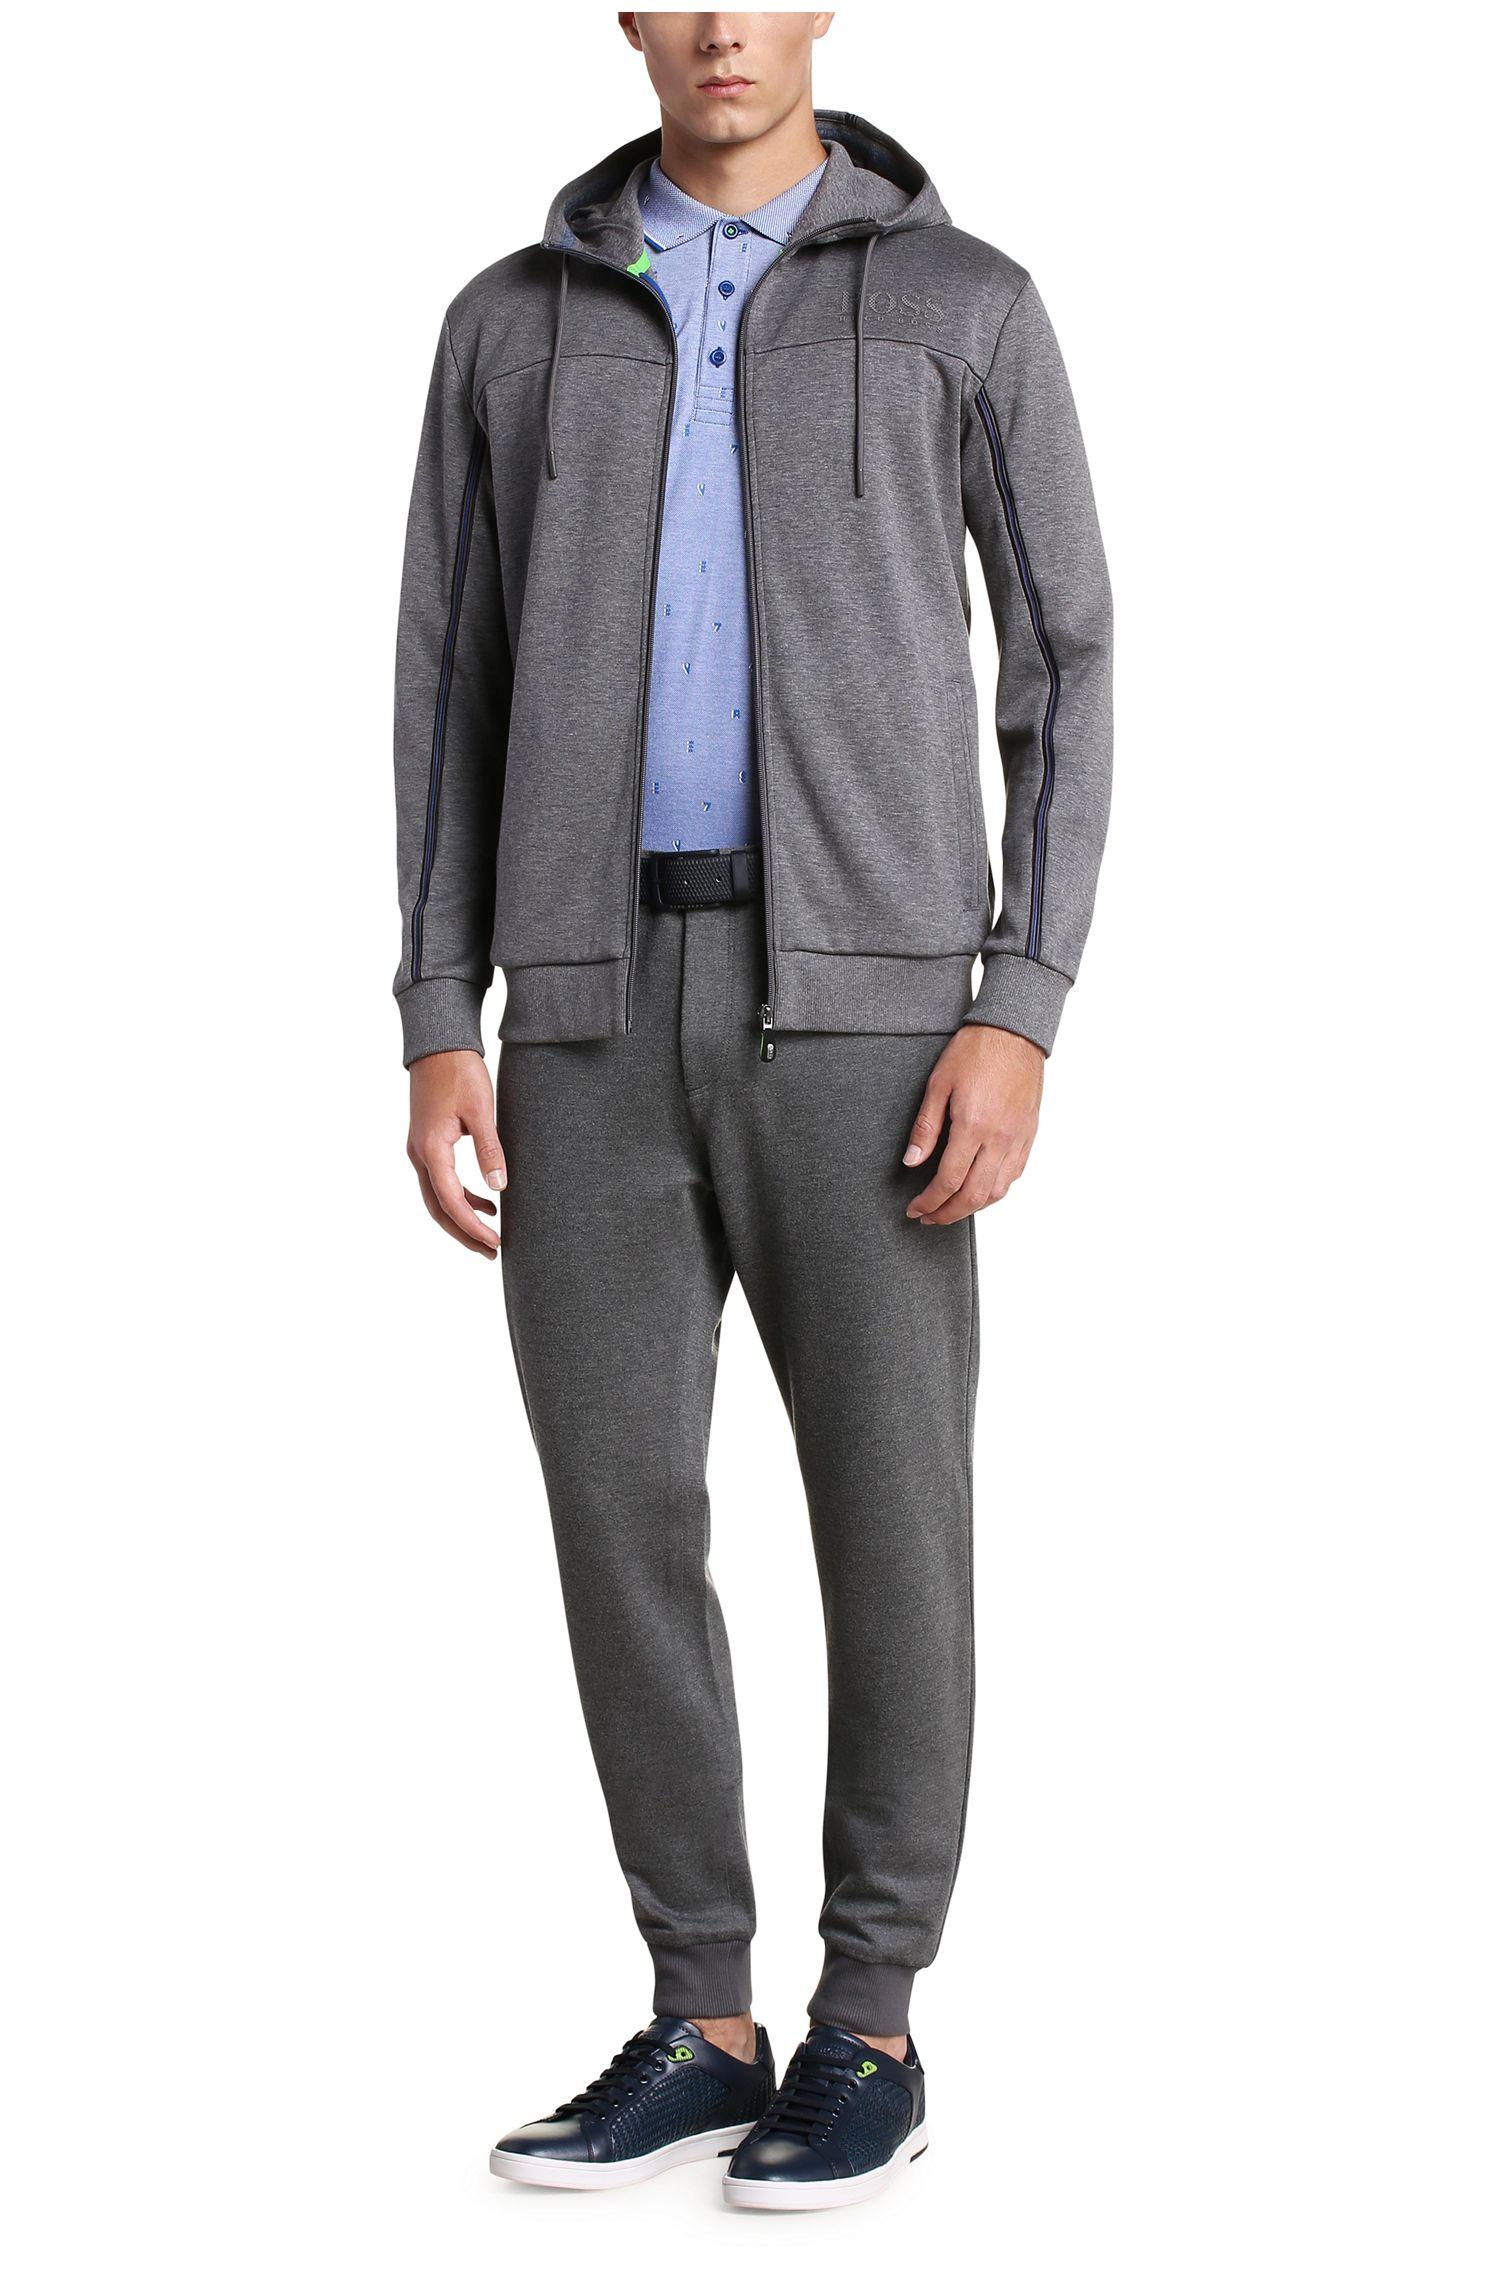 Regular-Fit Sweatshirt-Jacke aus Baumwoll-Mix: ´Saggy`